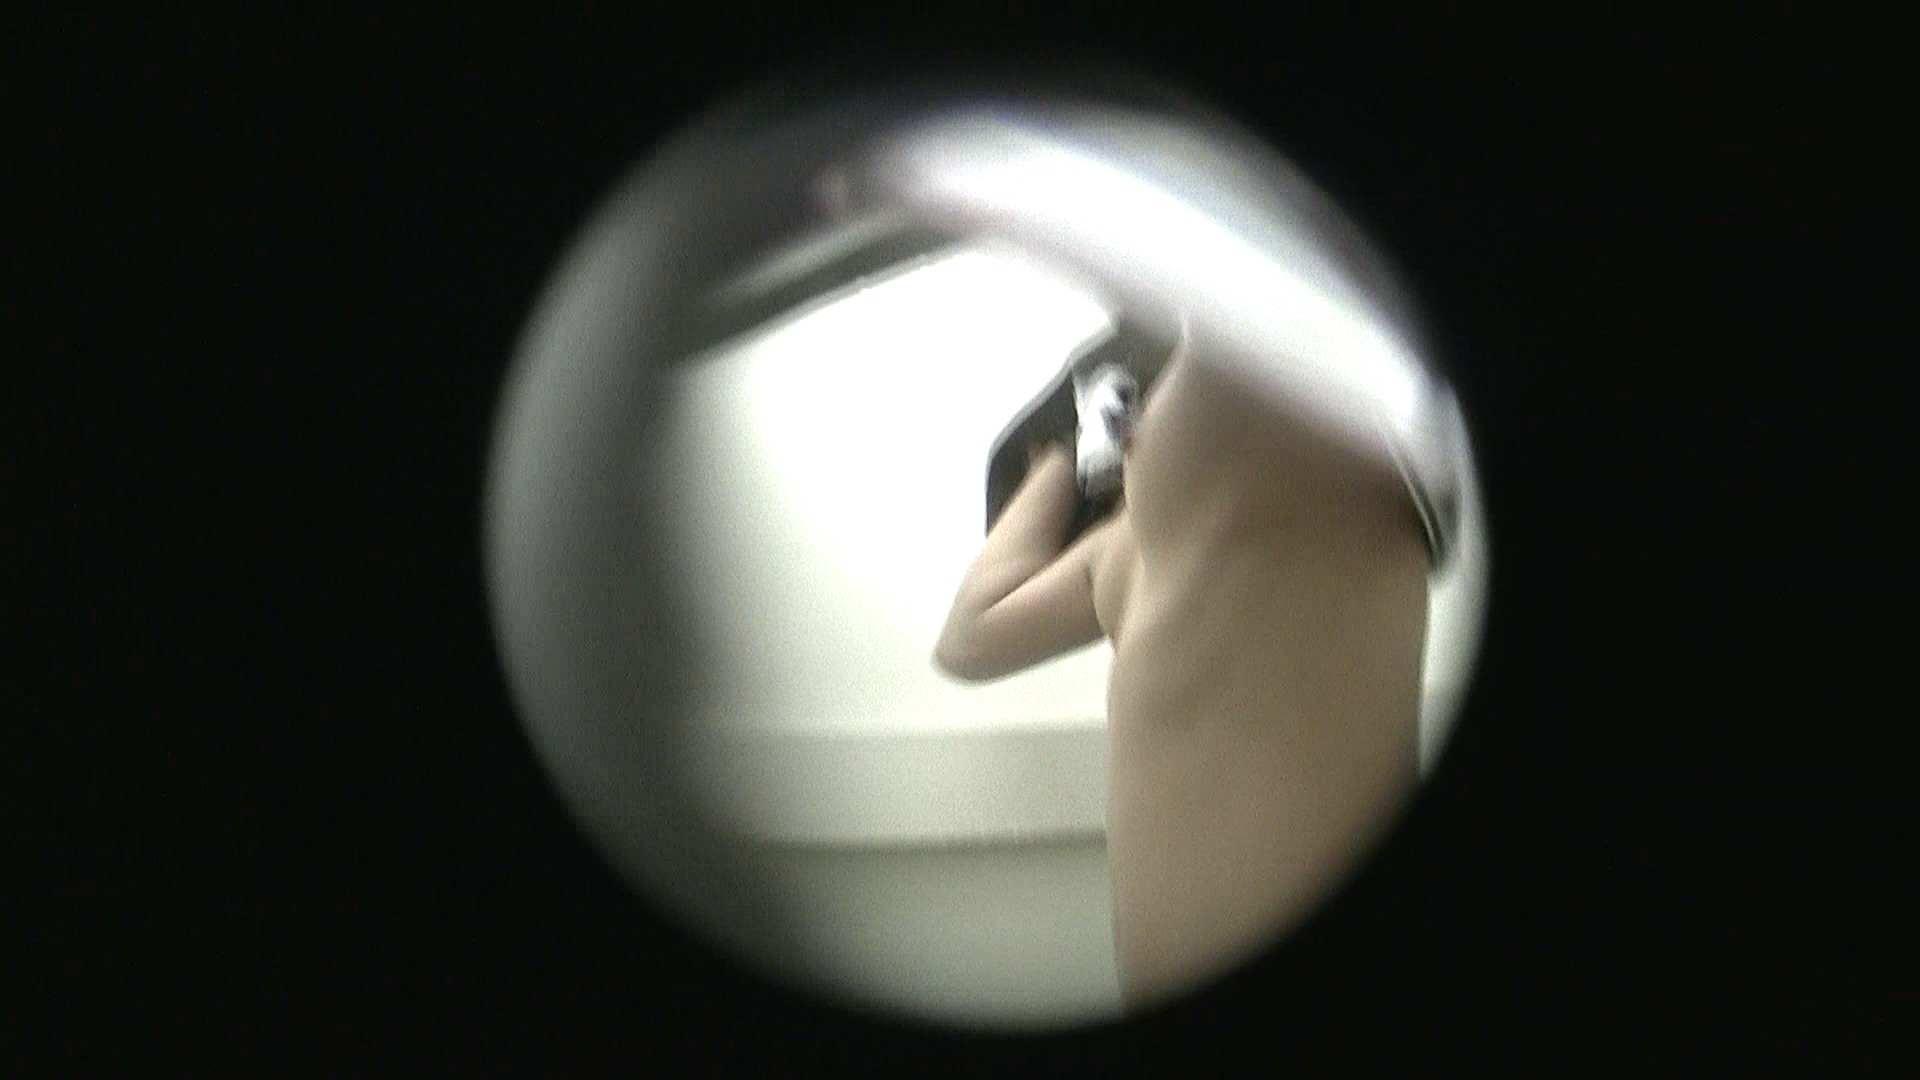 NO.22 何をニヤニヤしているのやら【MKB10位】 覗き セックス無修正動画無料 105枚